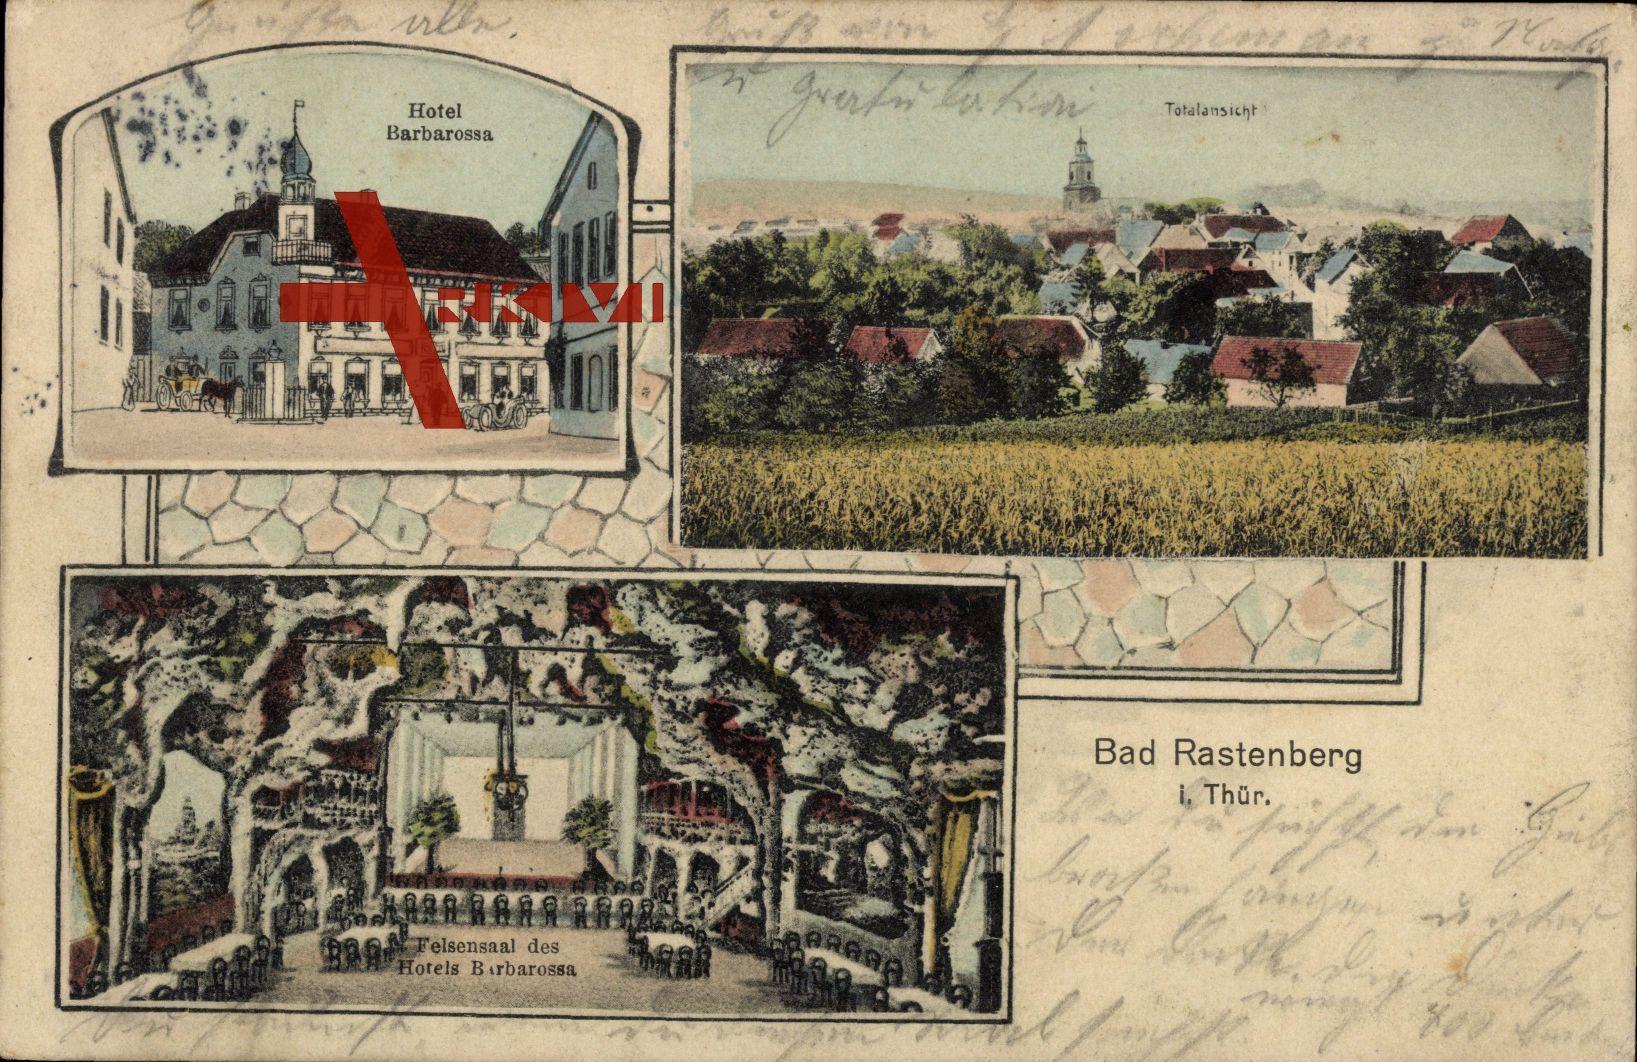 Rastenberg in Thüringen, Hotel Barbarossa, Felsensaal, Totalansicht des Ortes